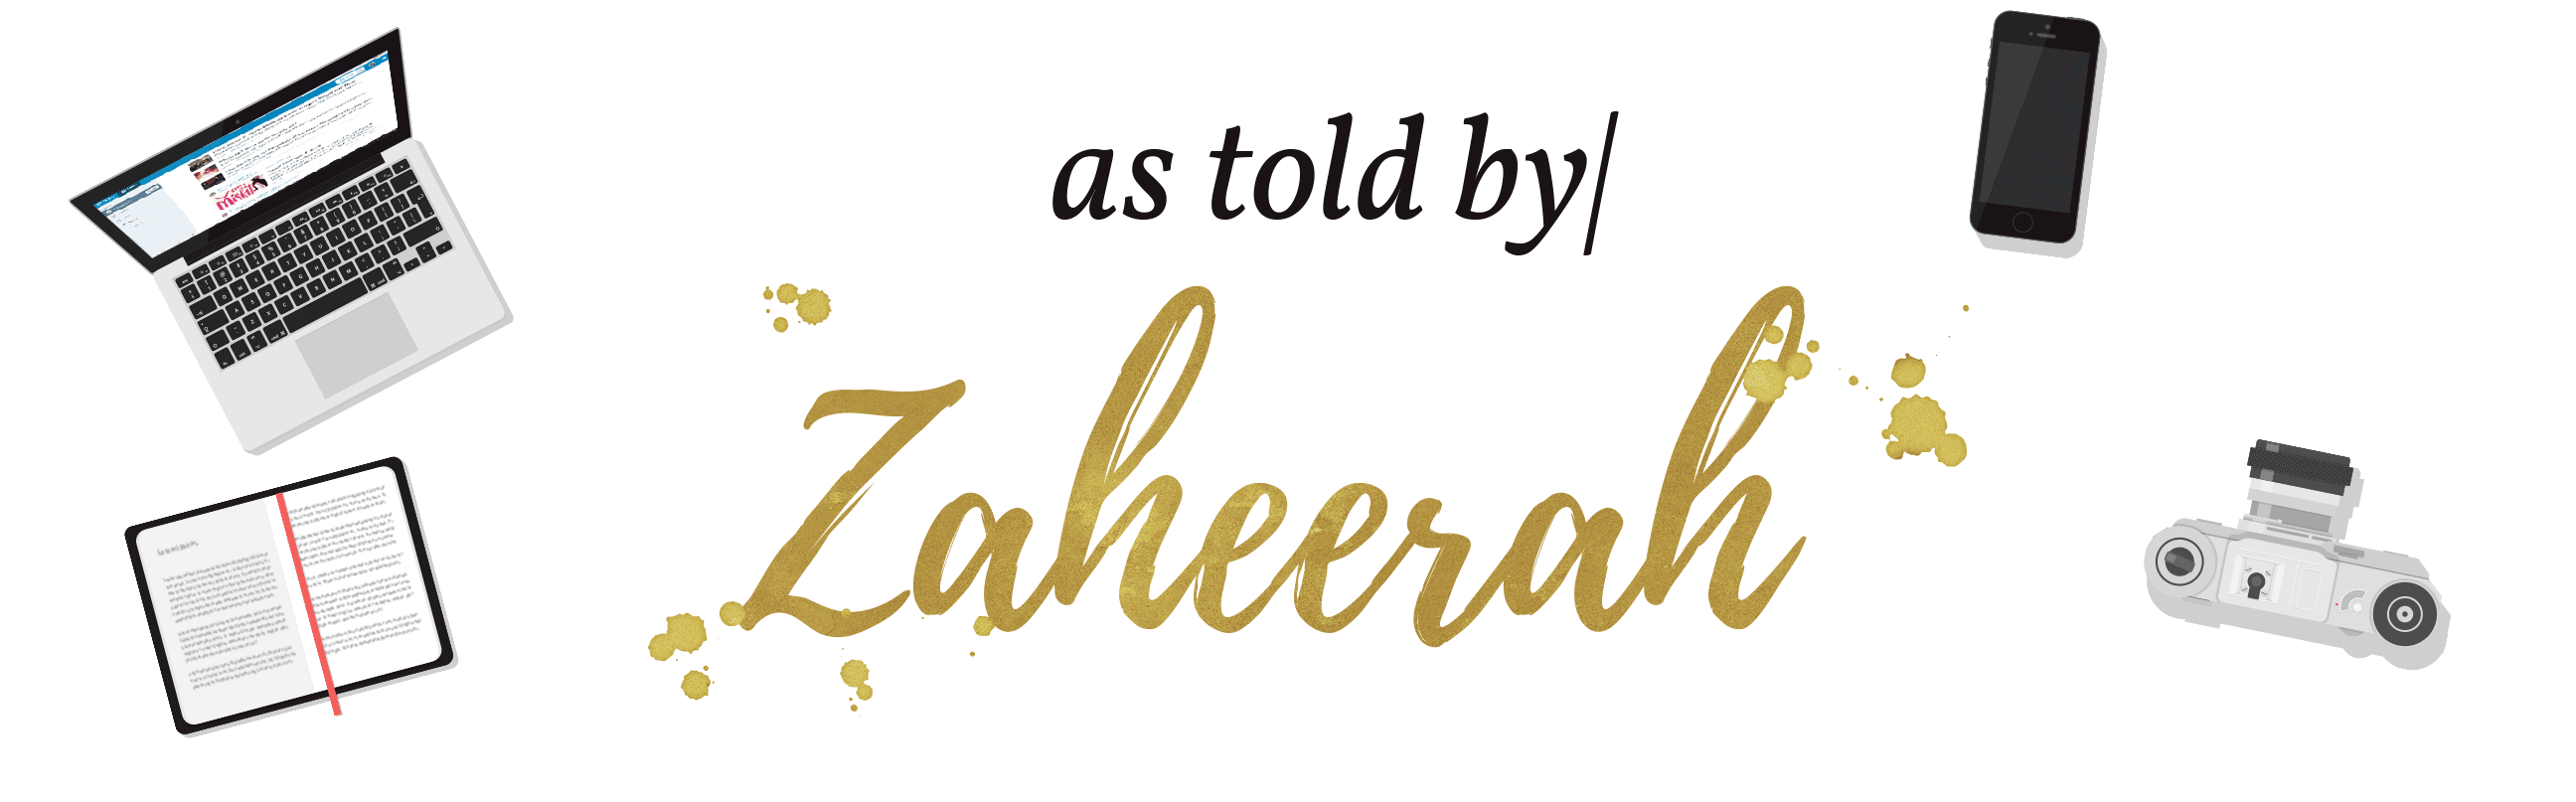 as told by zaheerah